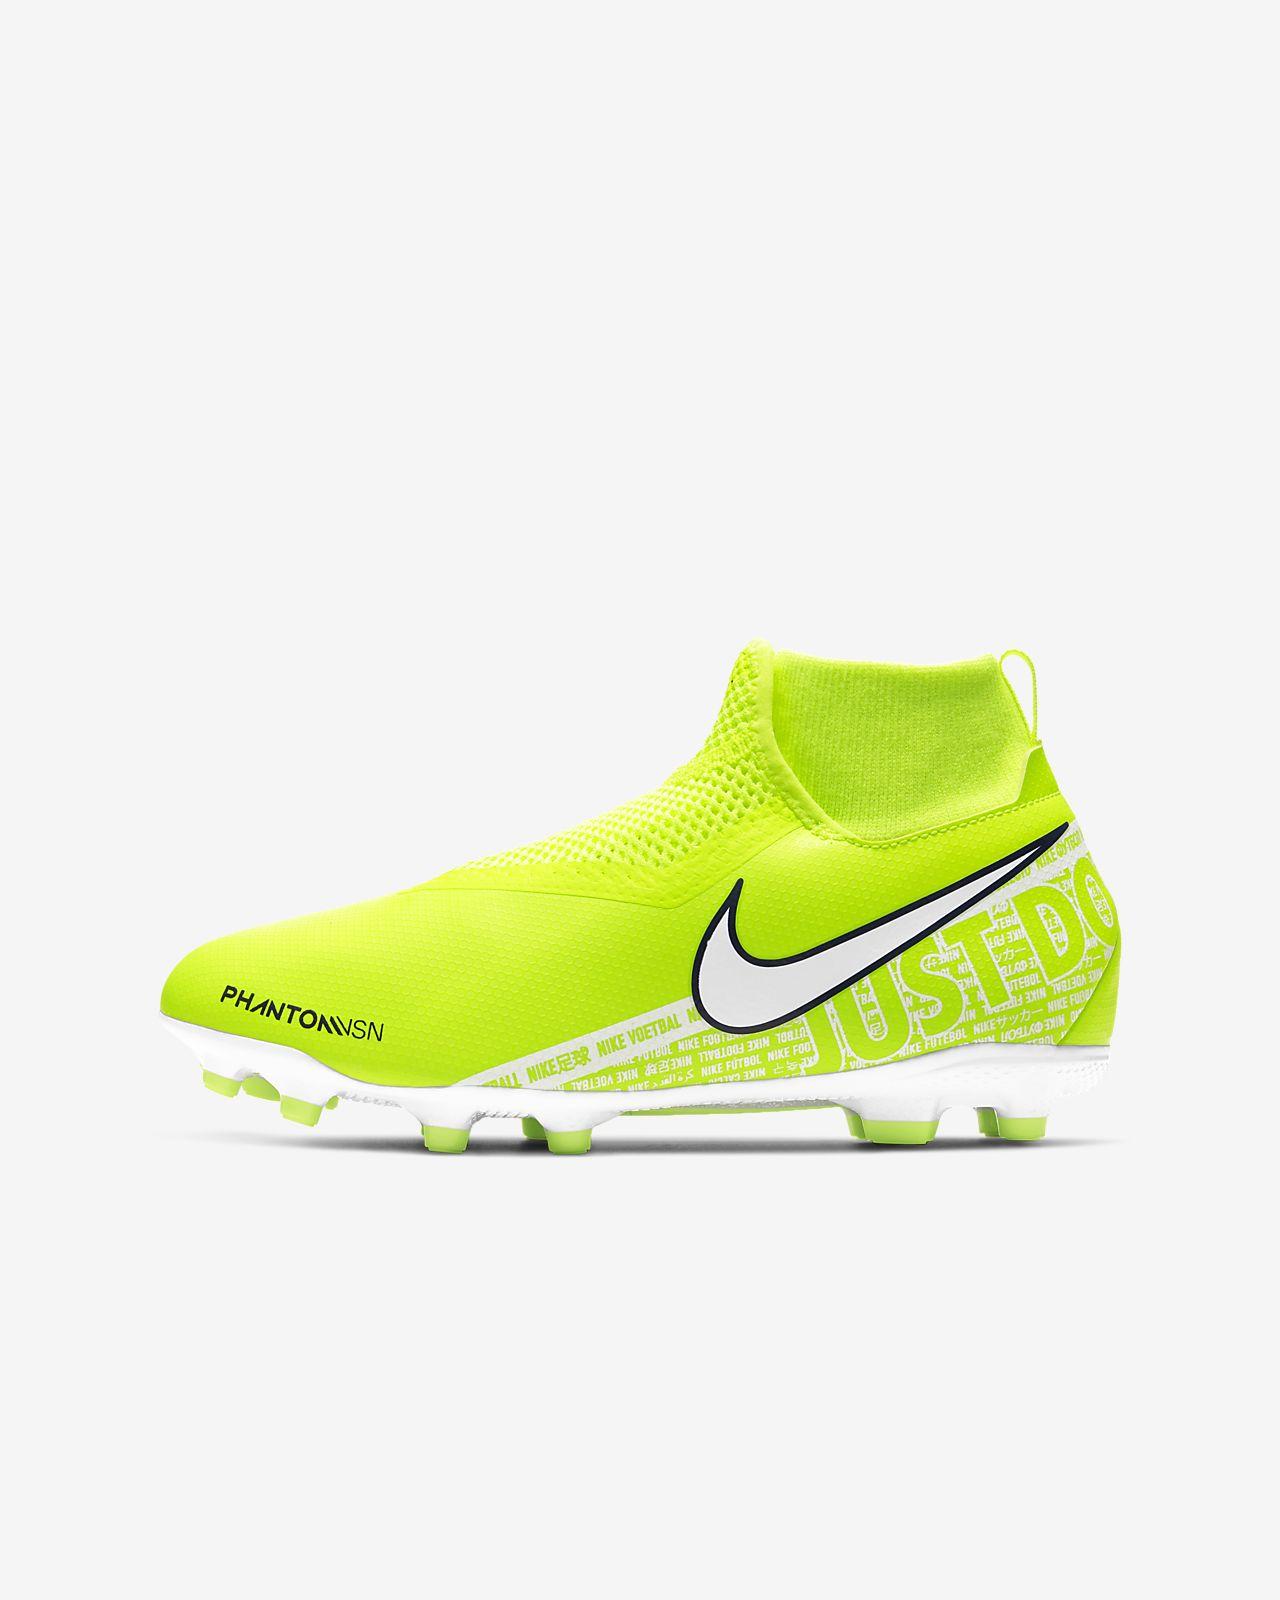 Calzado de fútbol para múltiples superficies para niños talla pequeña/grande Nike Jr. Phantom Vision Academy Dynamic Fit MG